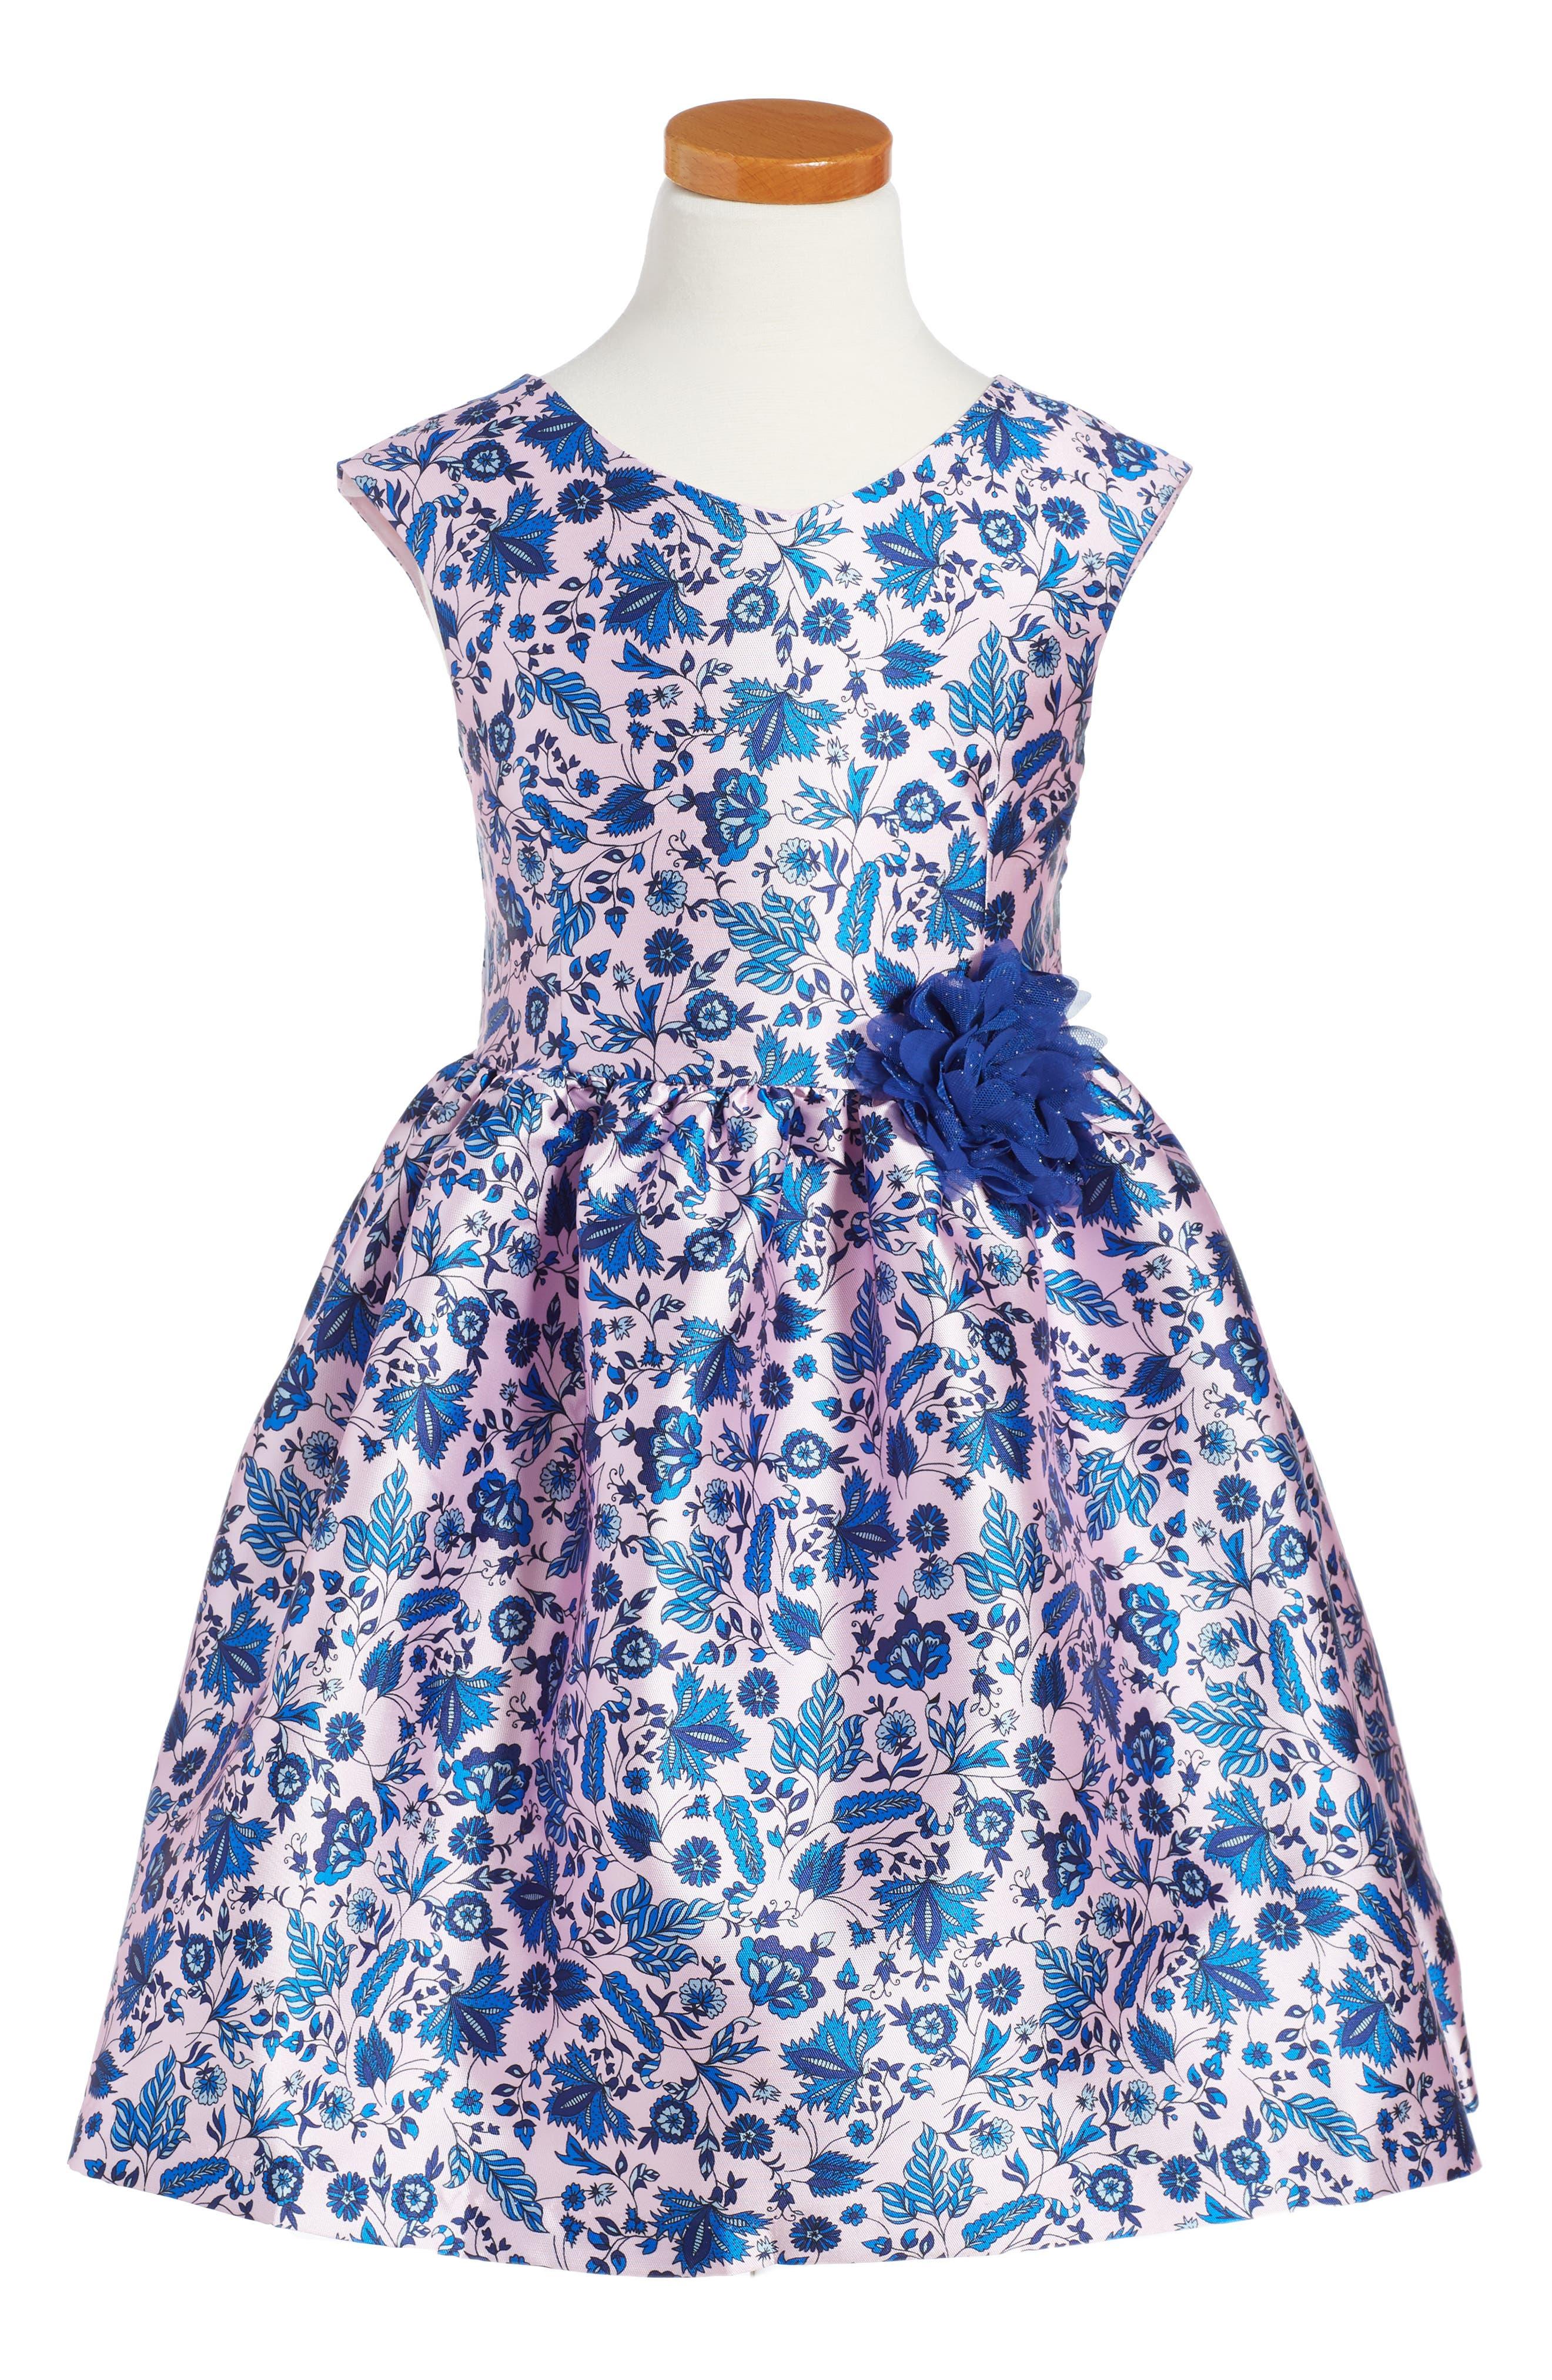 Main Image - Pippa & Julie Print Fit & Flare Dress (Toddler Girls, Little Girls & Big Girls)